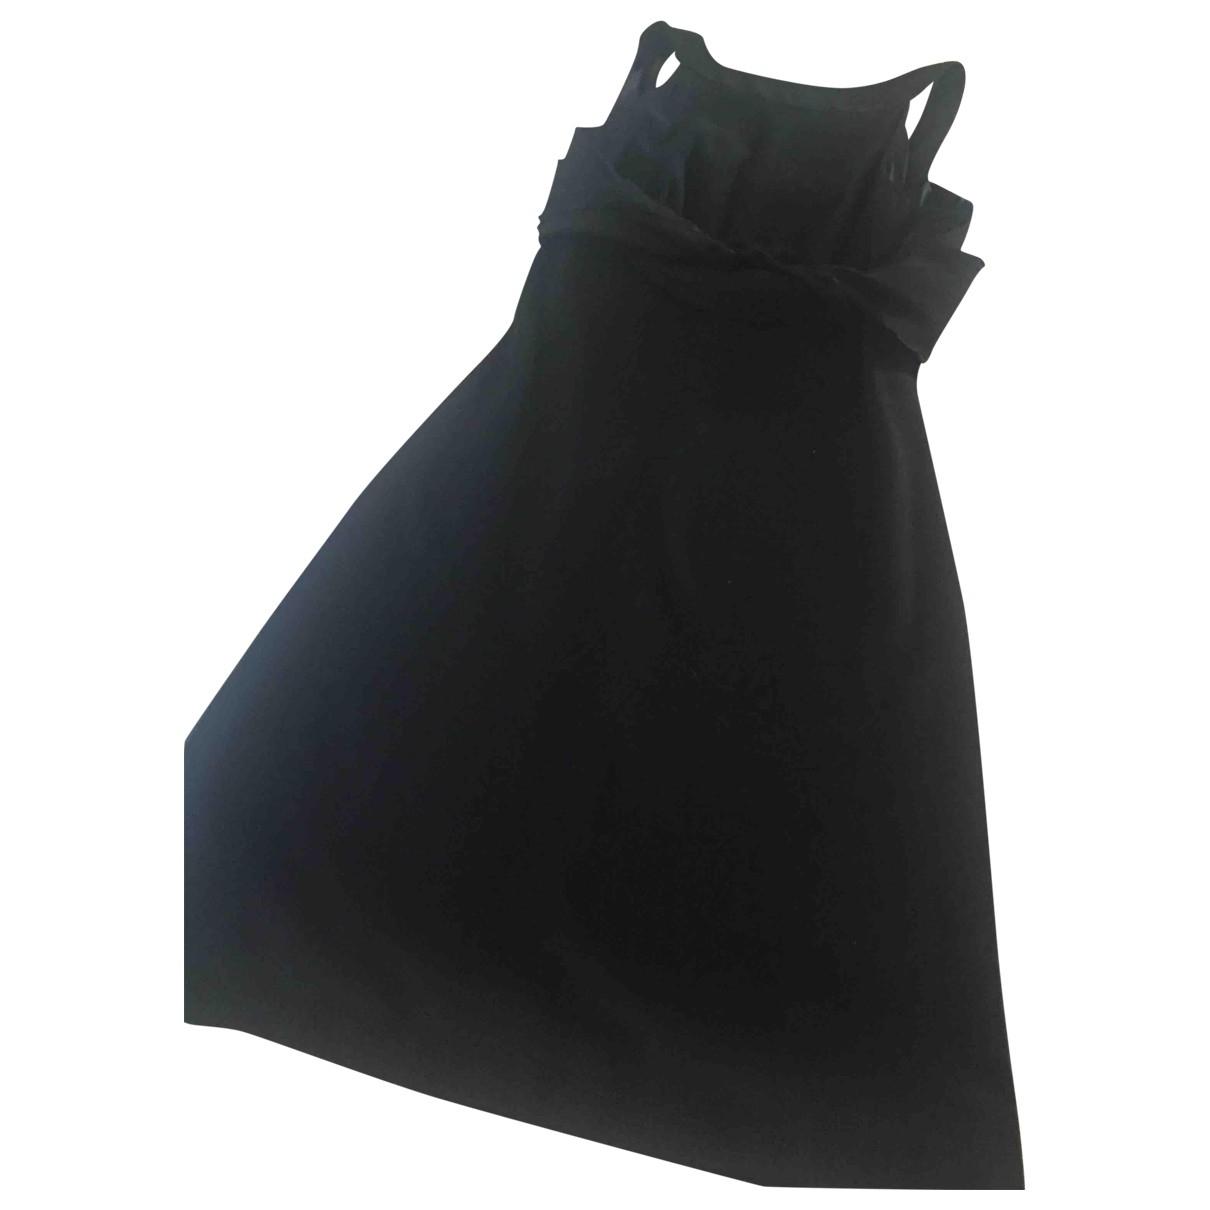 Gianfranco Ferre \N Kleid in  Schwarz Viskose